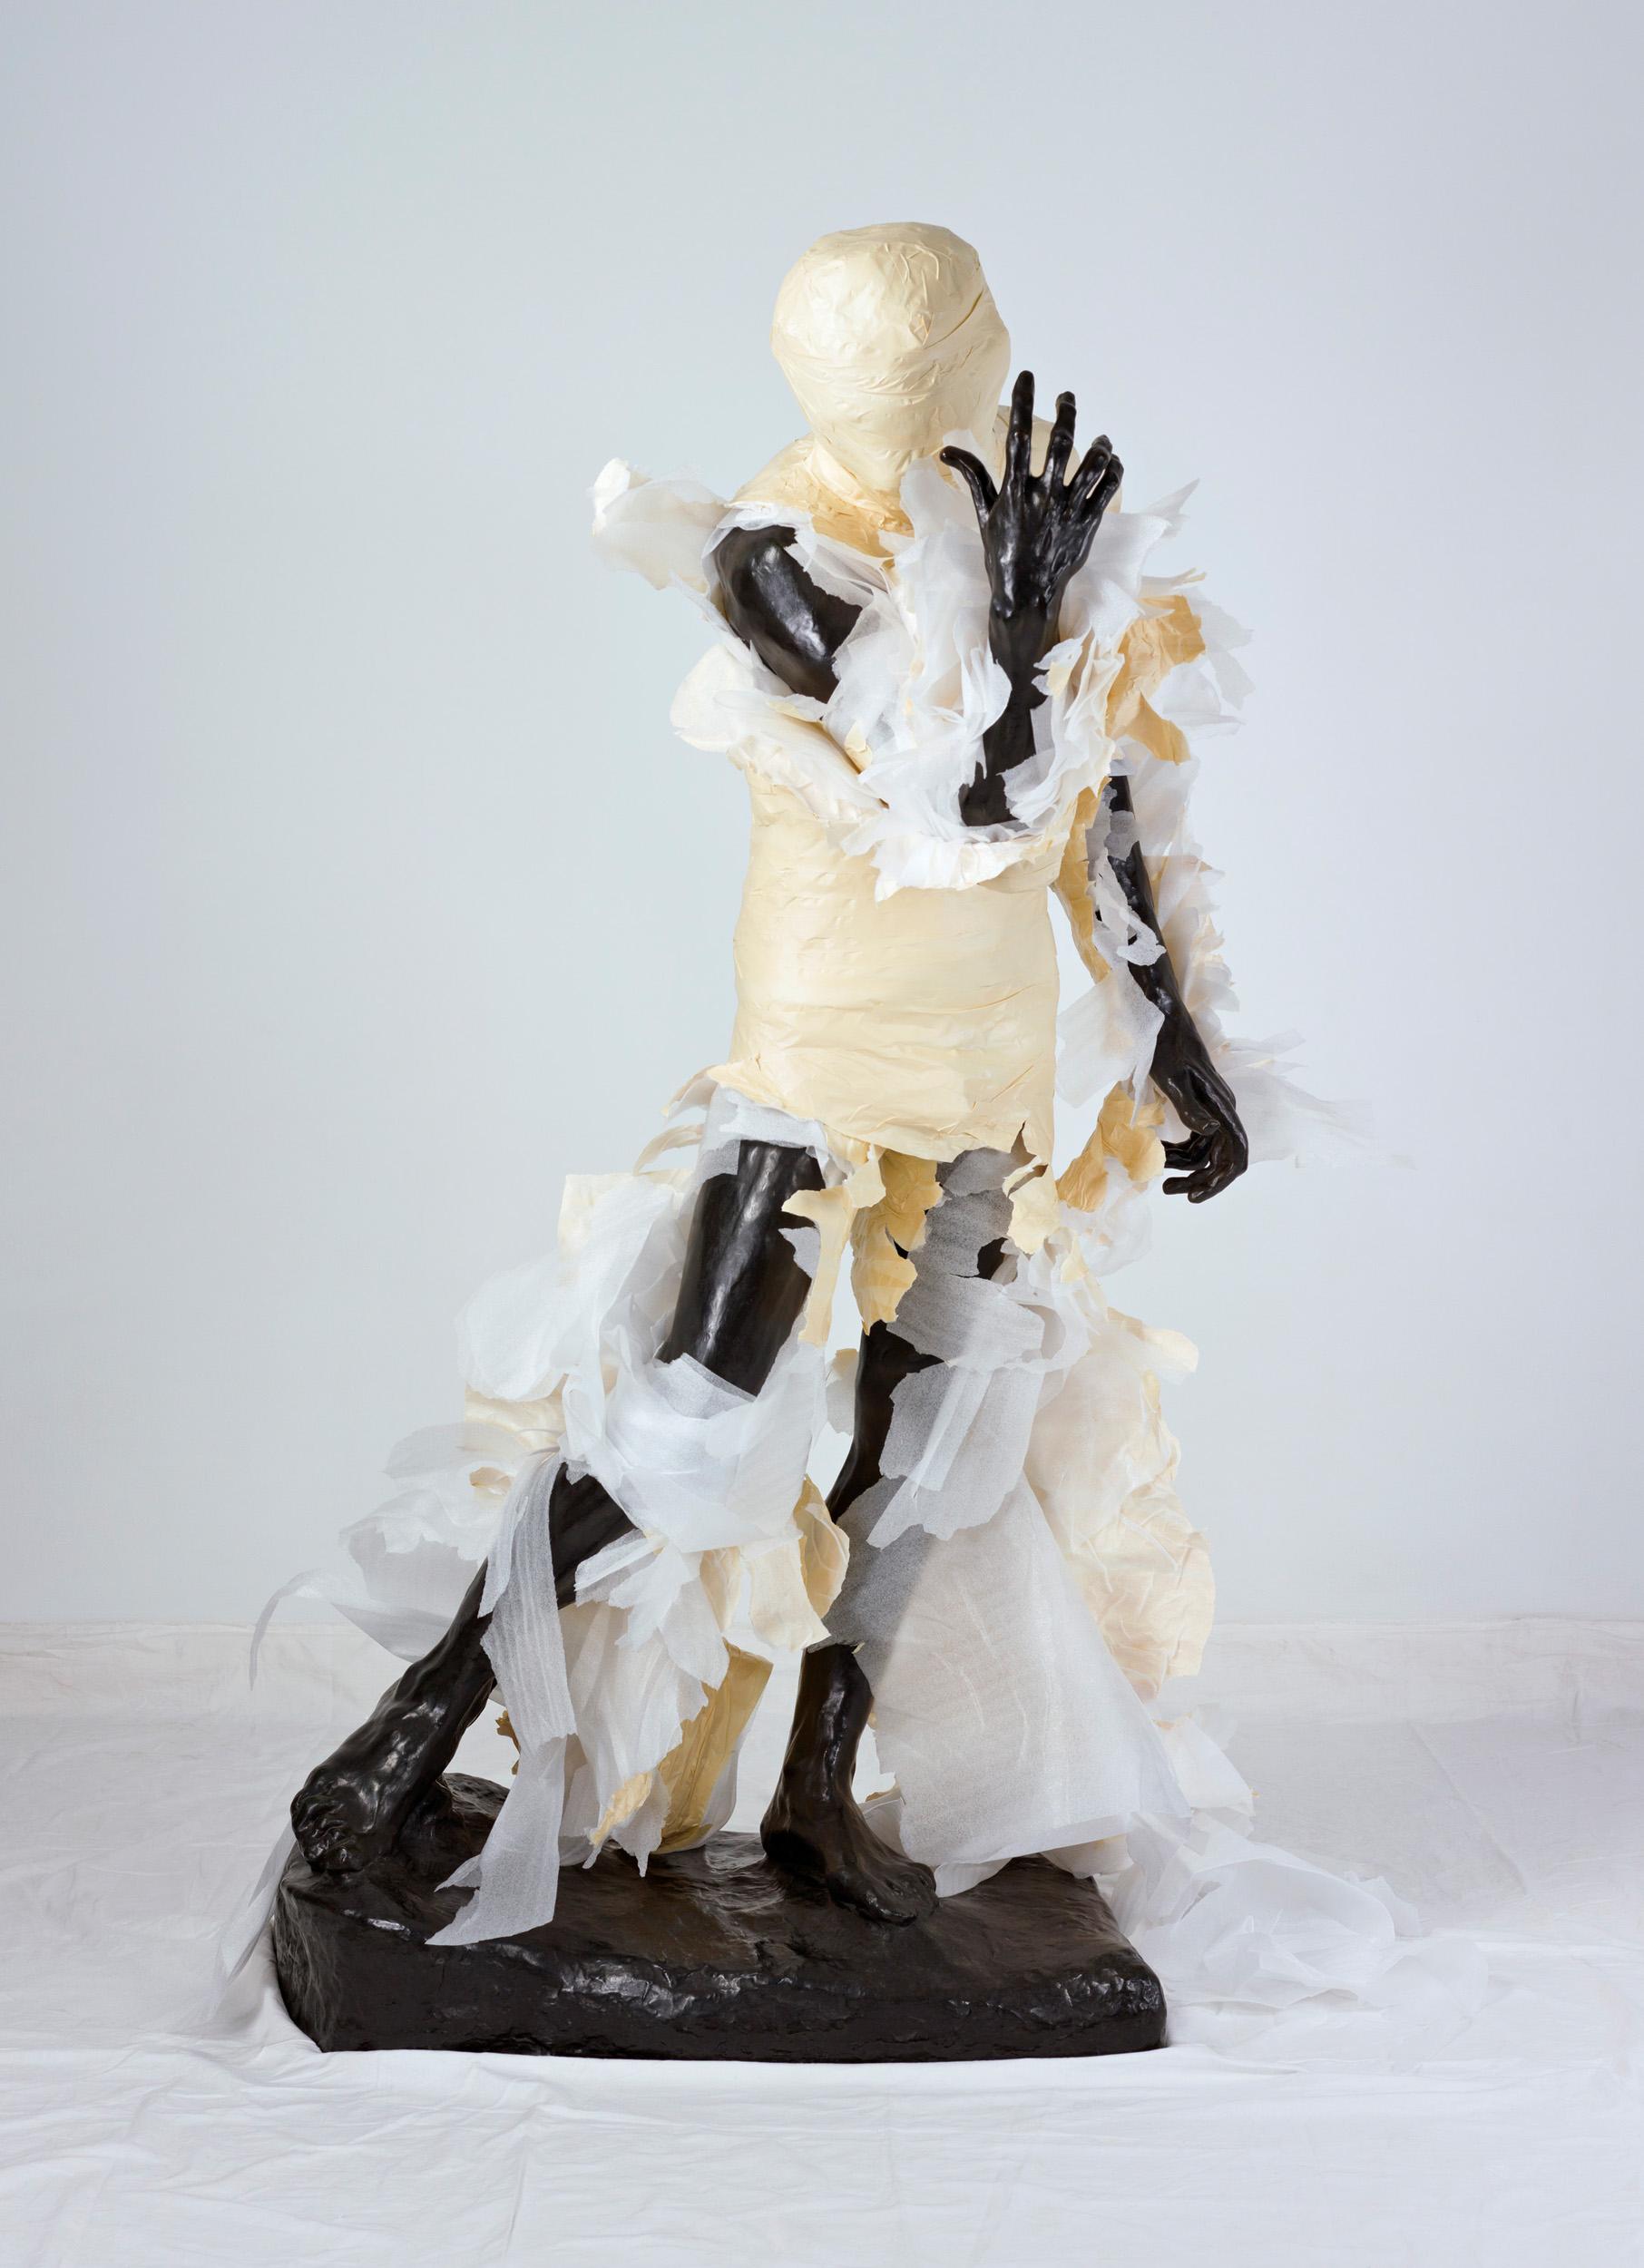 2010_Unwrapping_Rodin_White_5.jpg